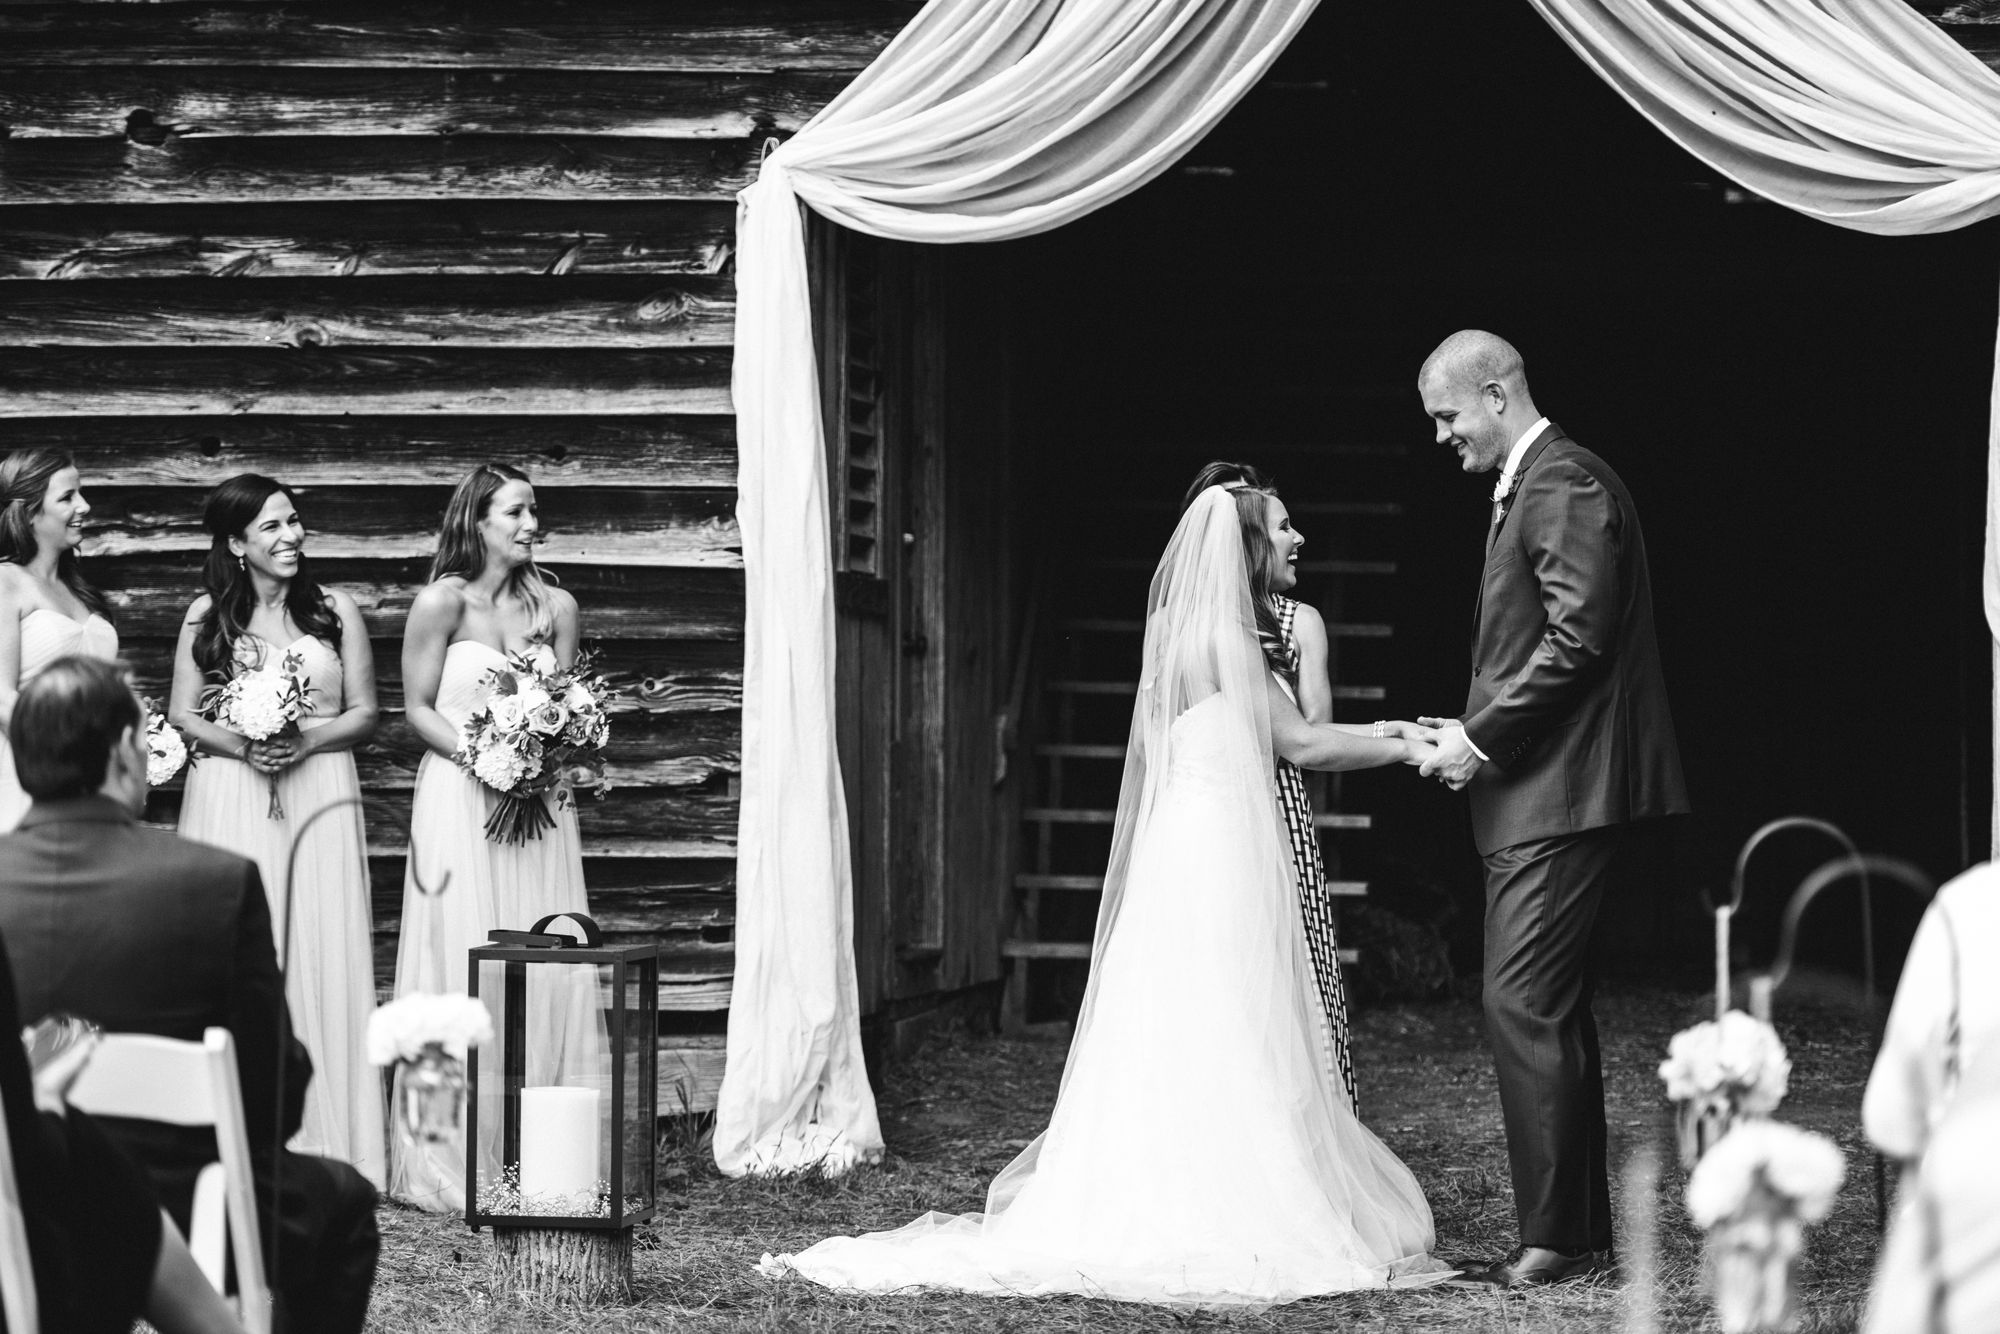 beaver-dam-house-davidson-nc-wedding-photos 55